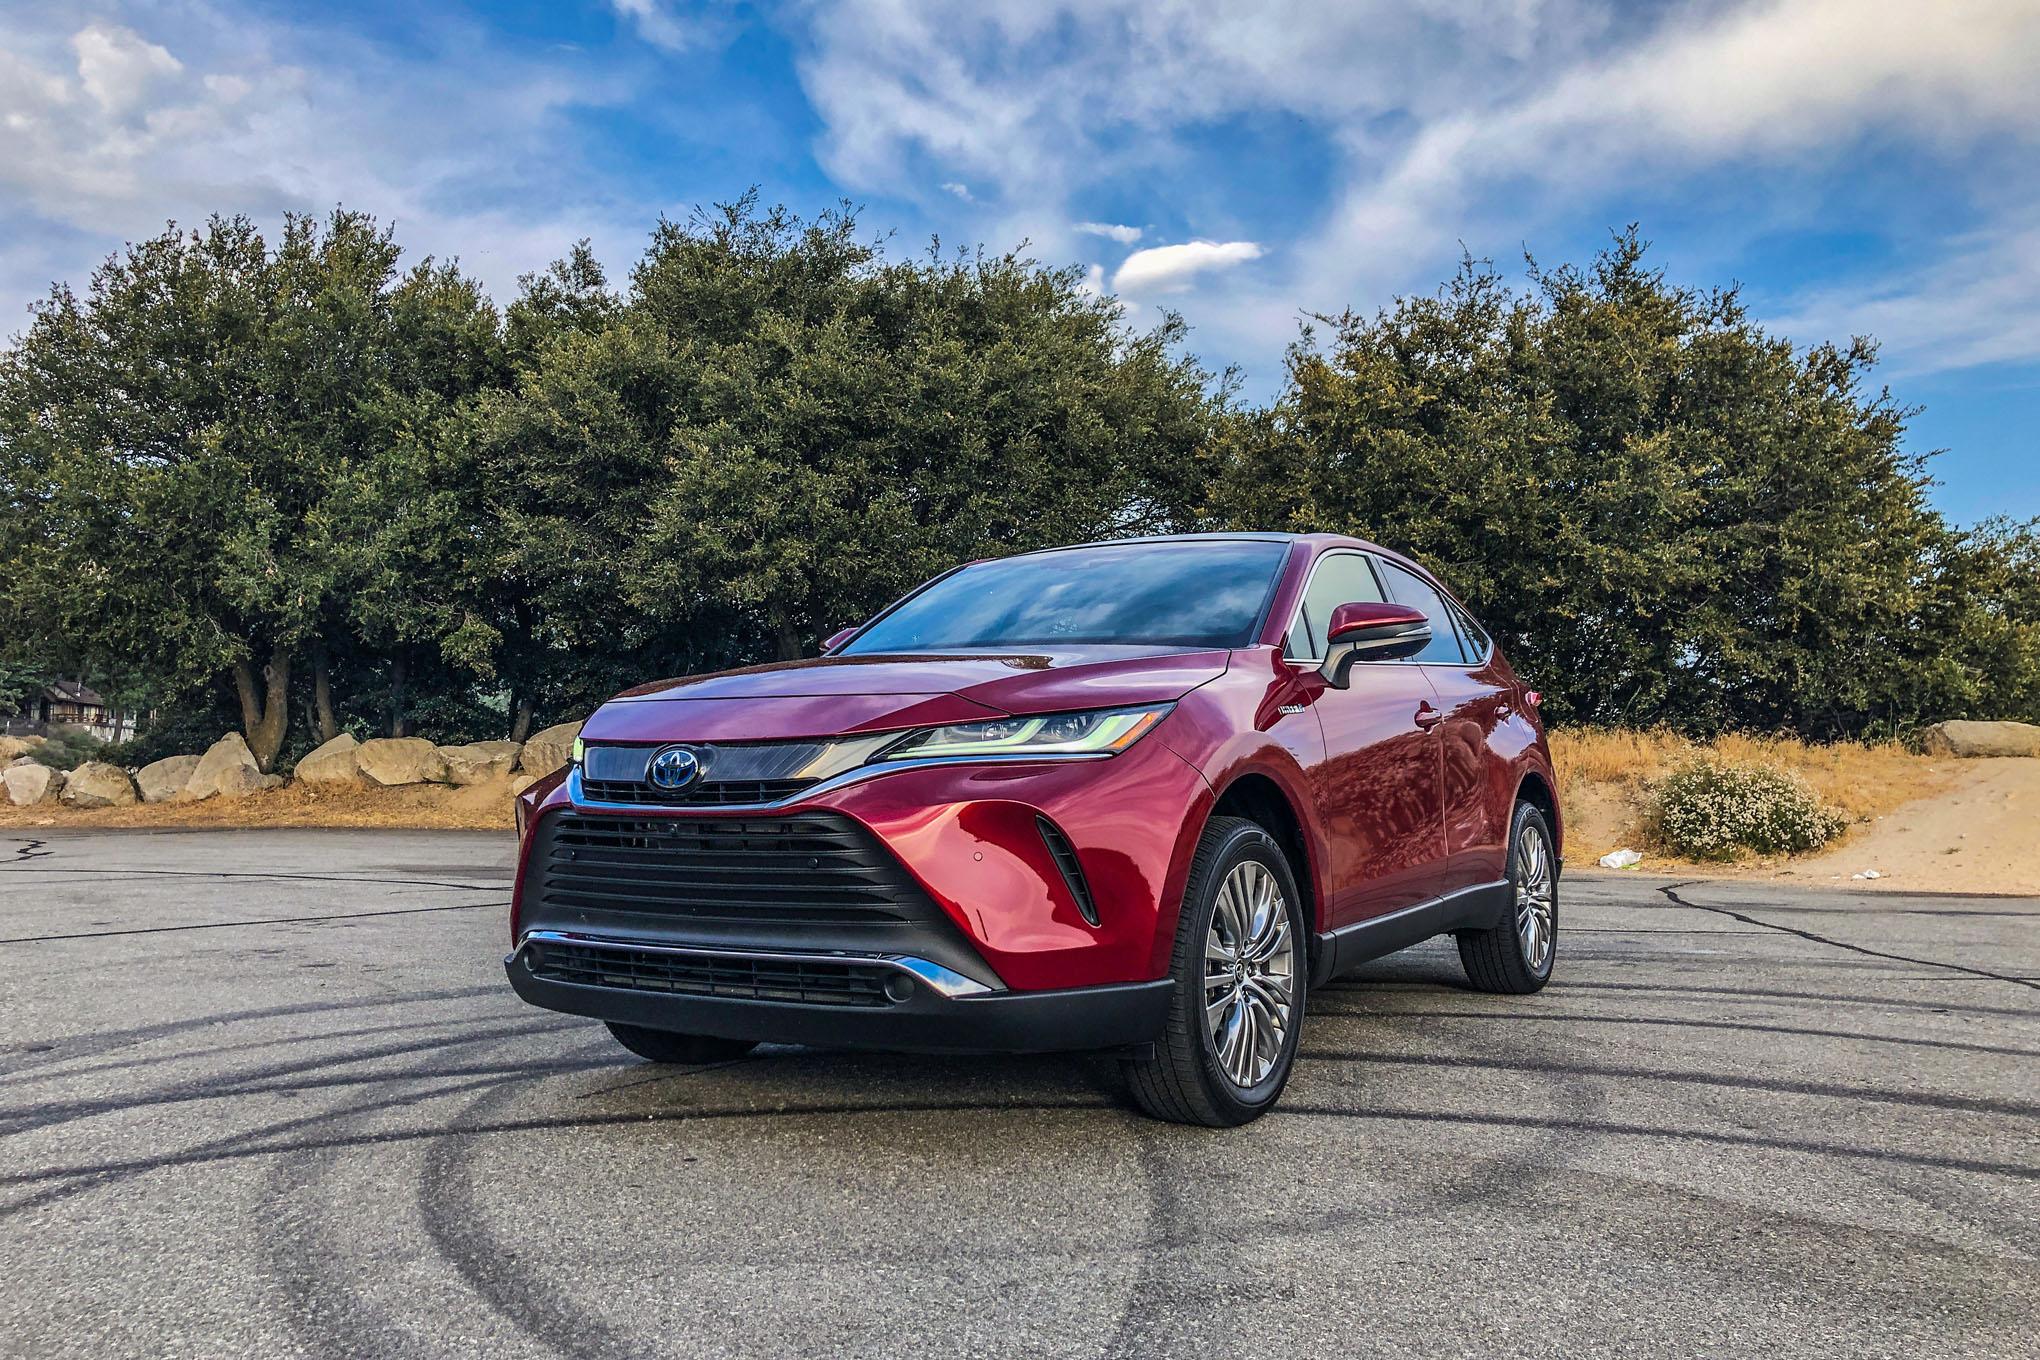 2021 Toyota Venza Daily Driven